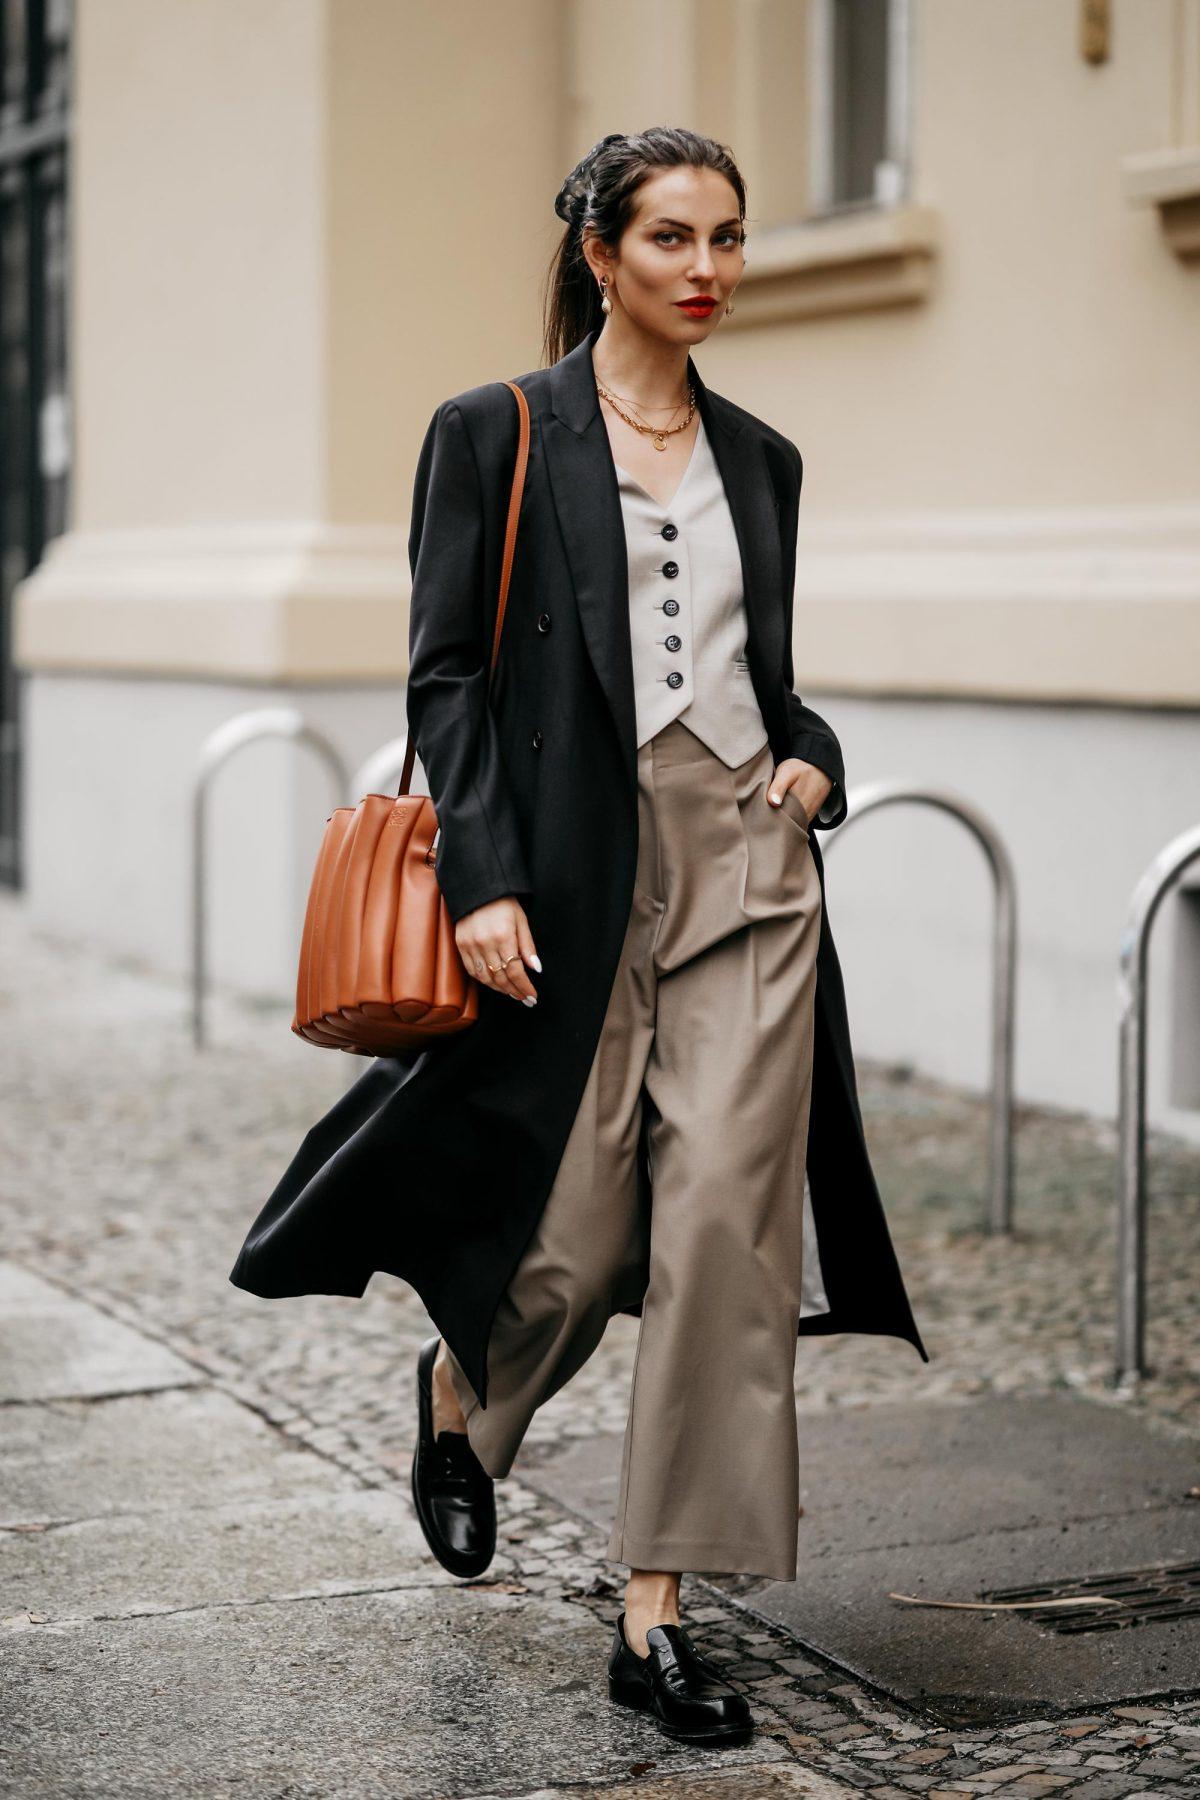 The Business Parisienne